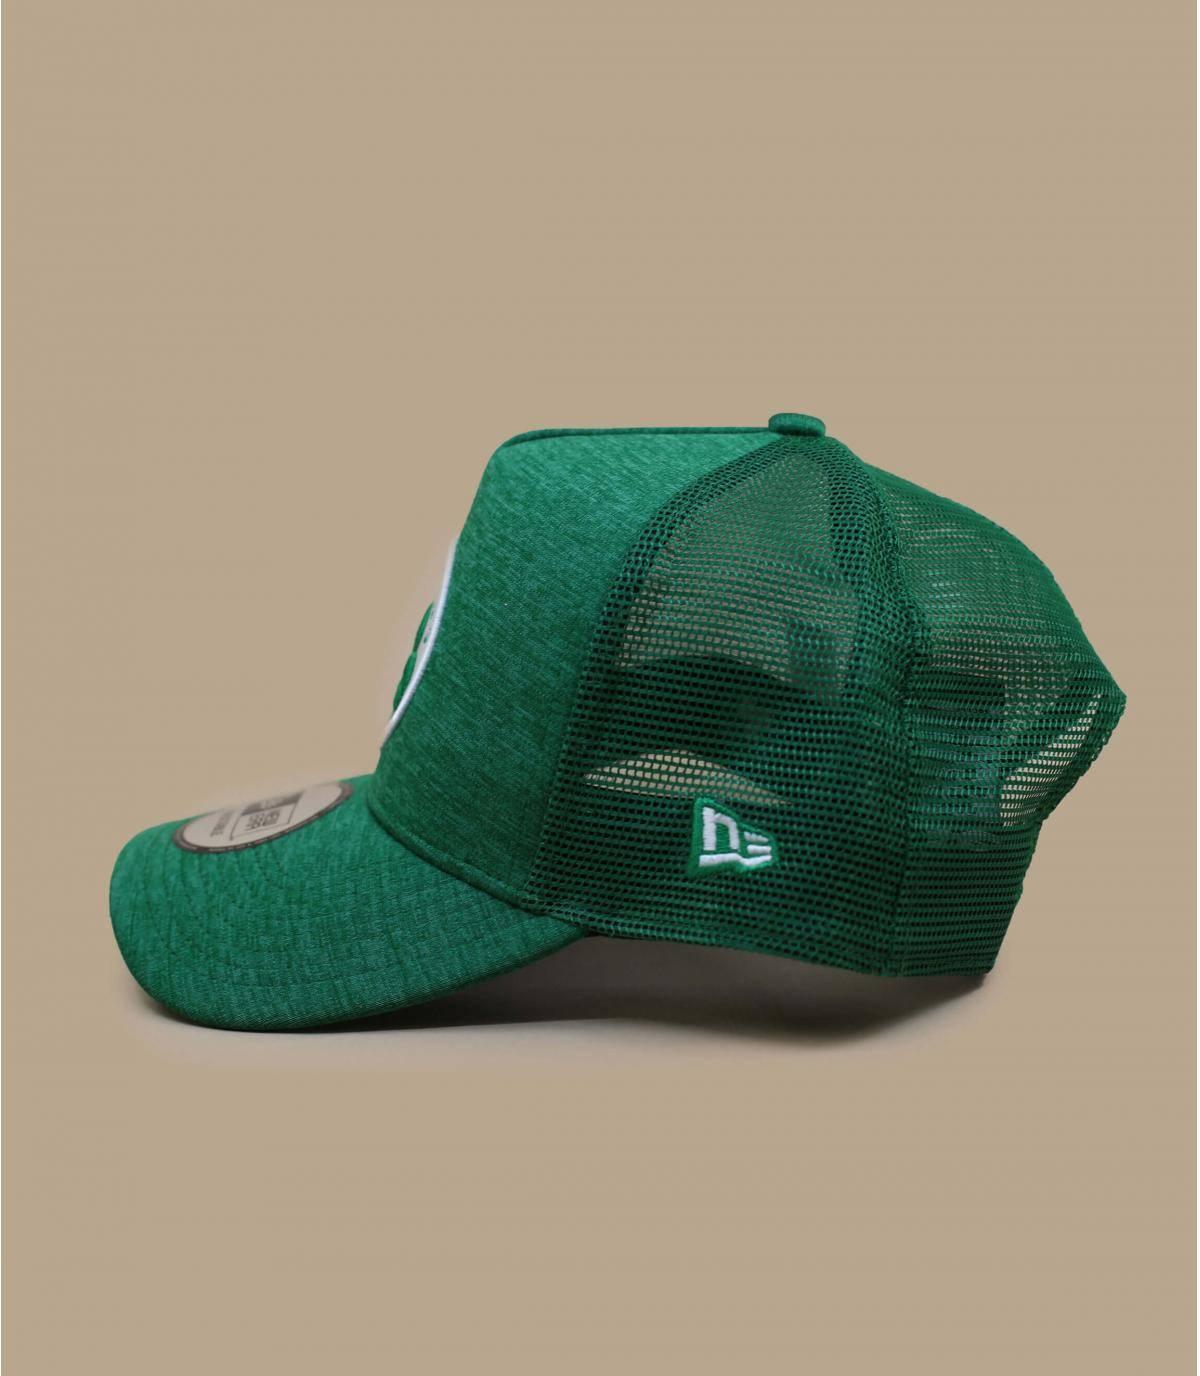 Details Trucker Shadown Tech Celtics - afbeeling 3